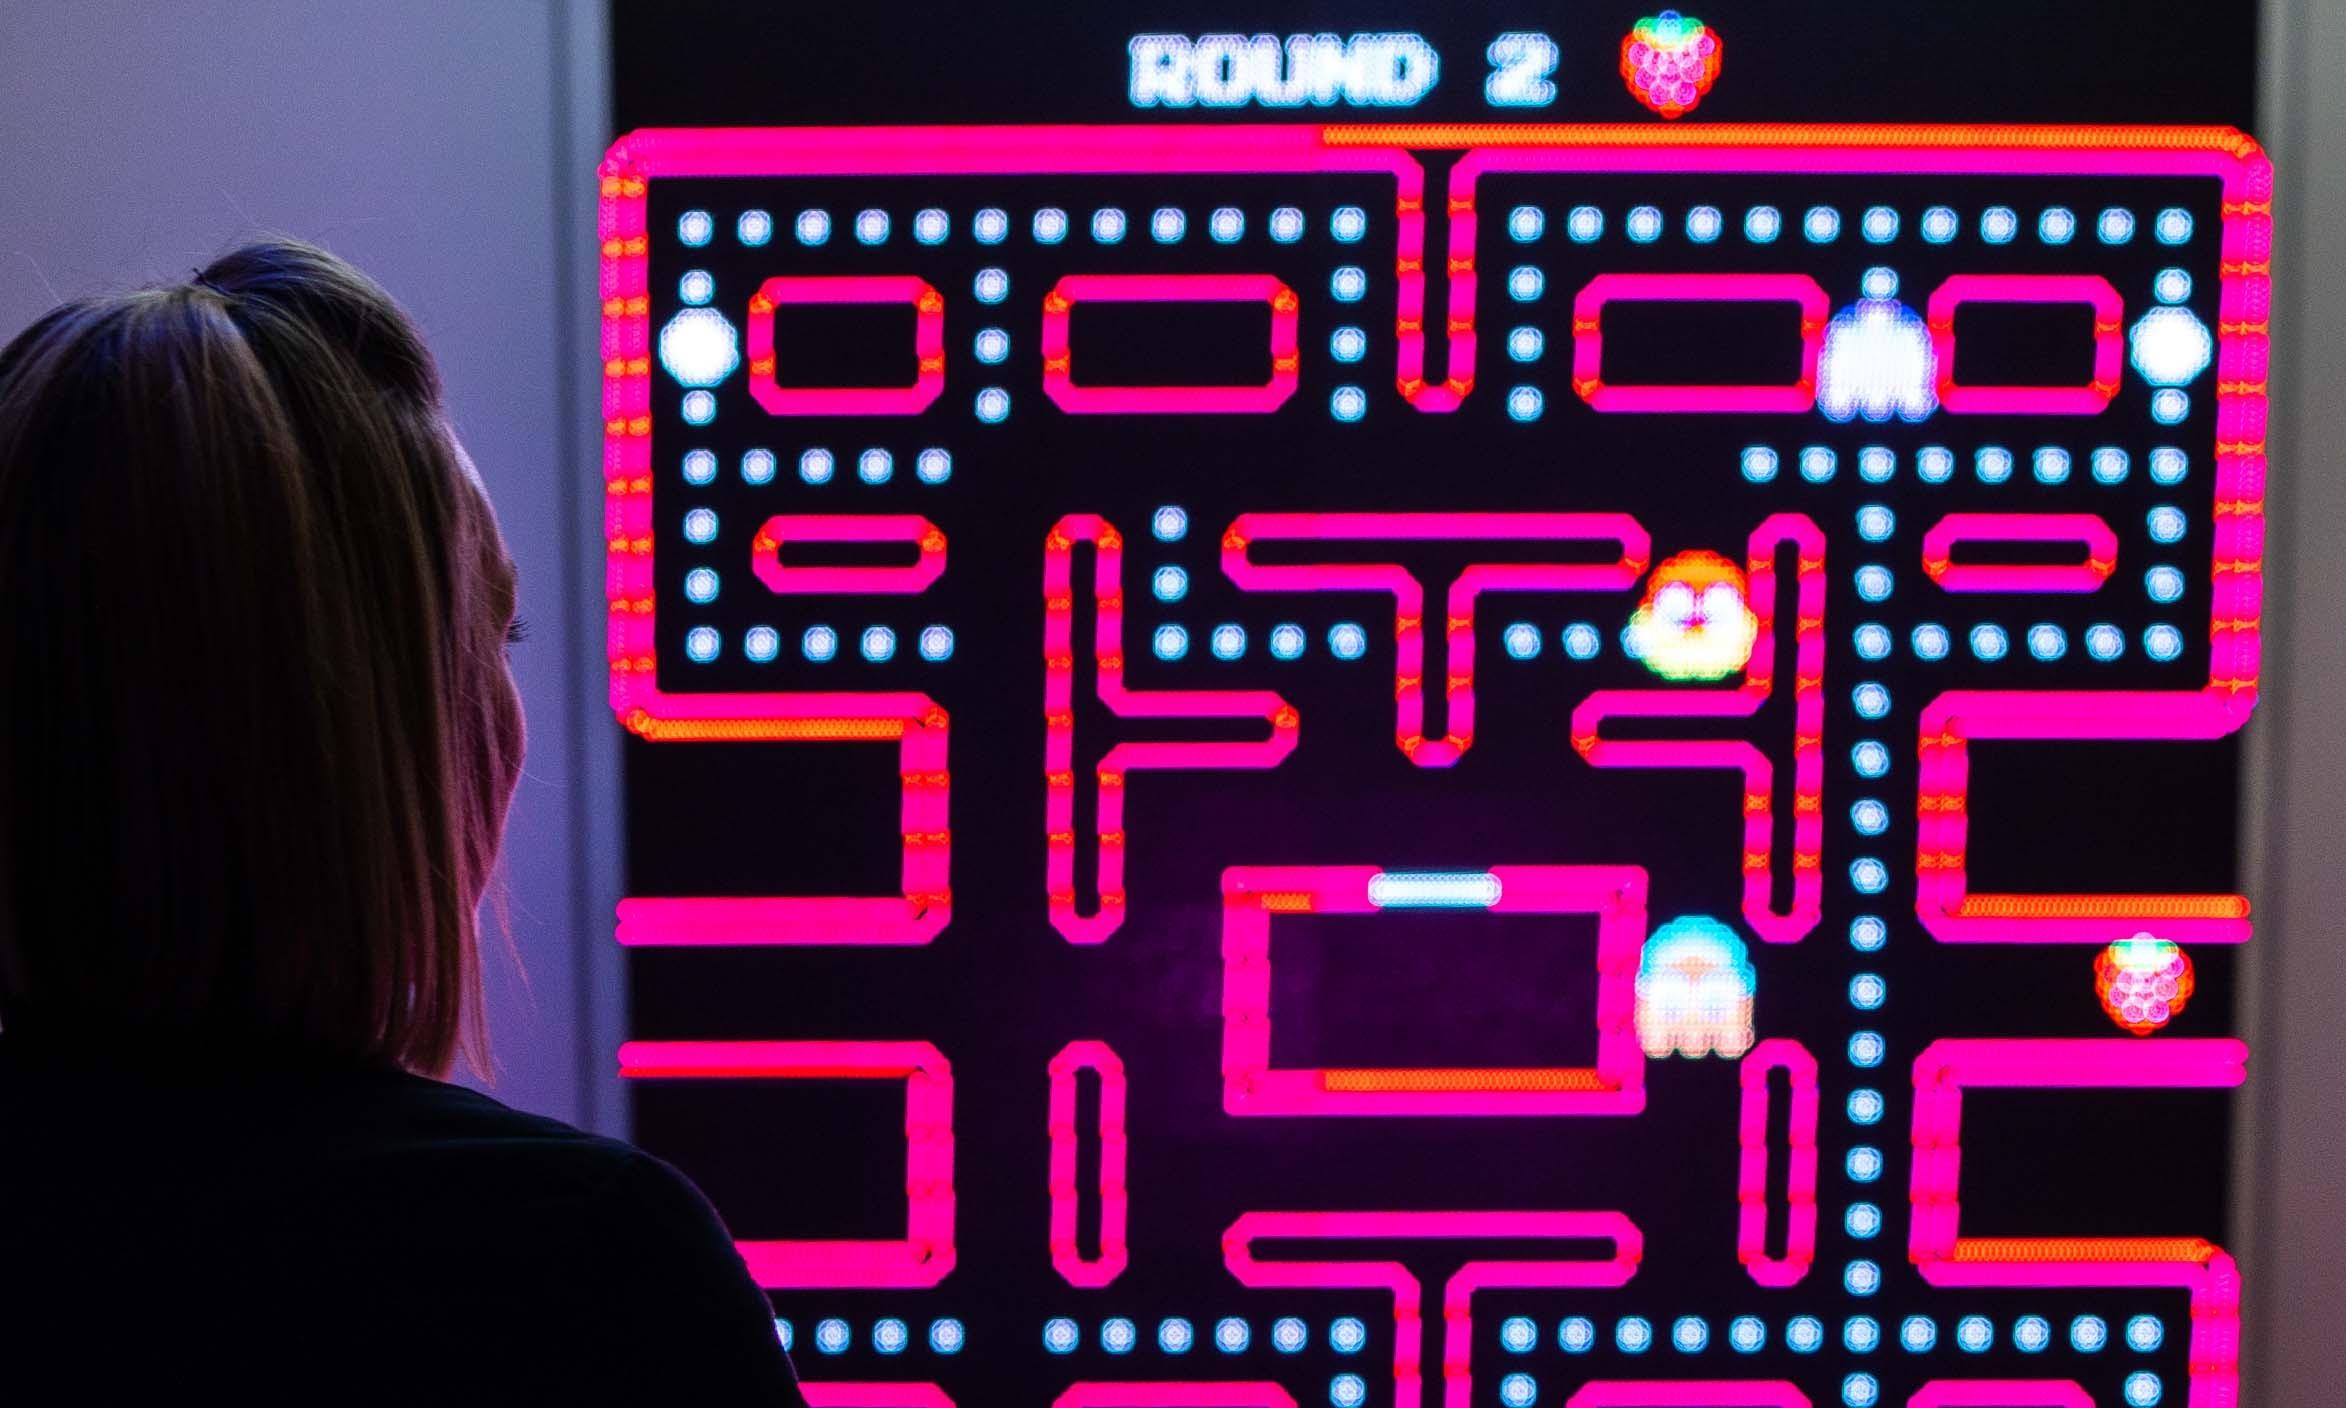 Giant_Pacman_3.jpg